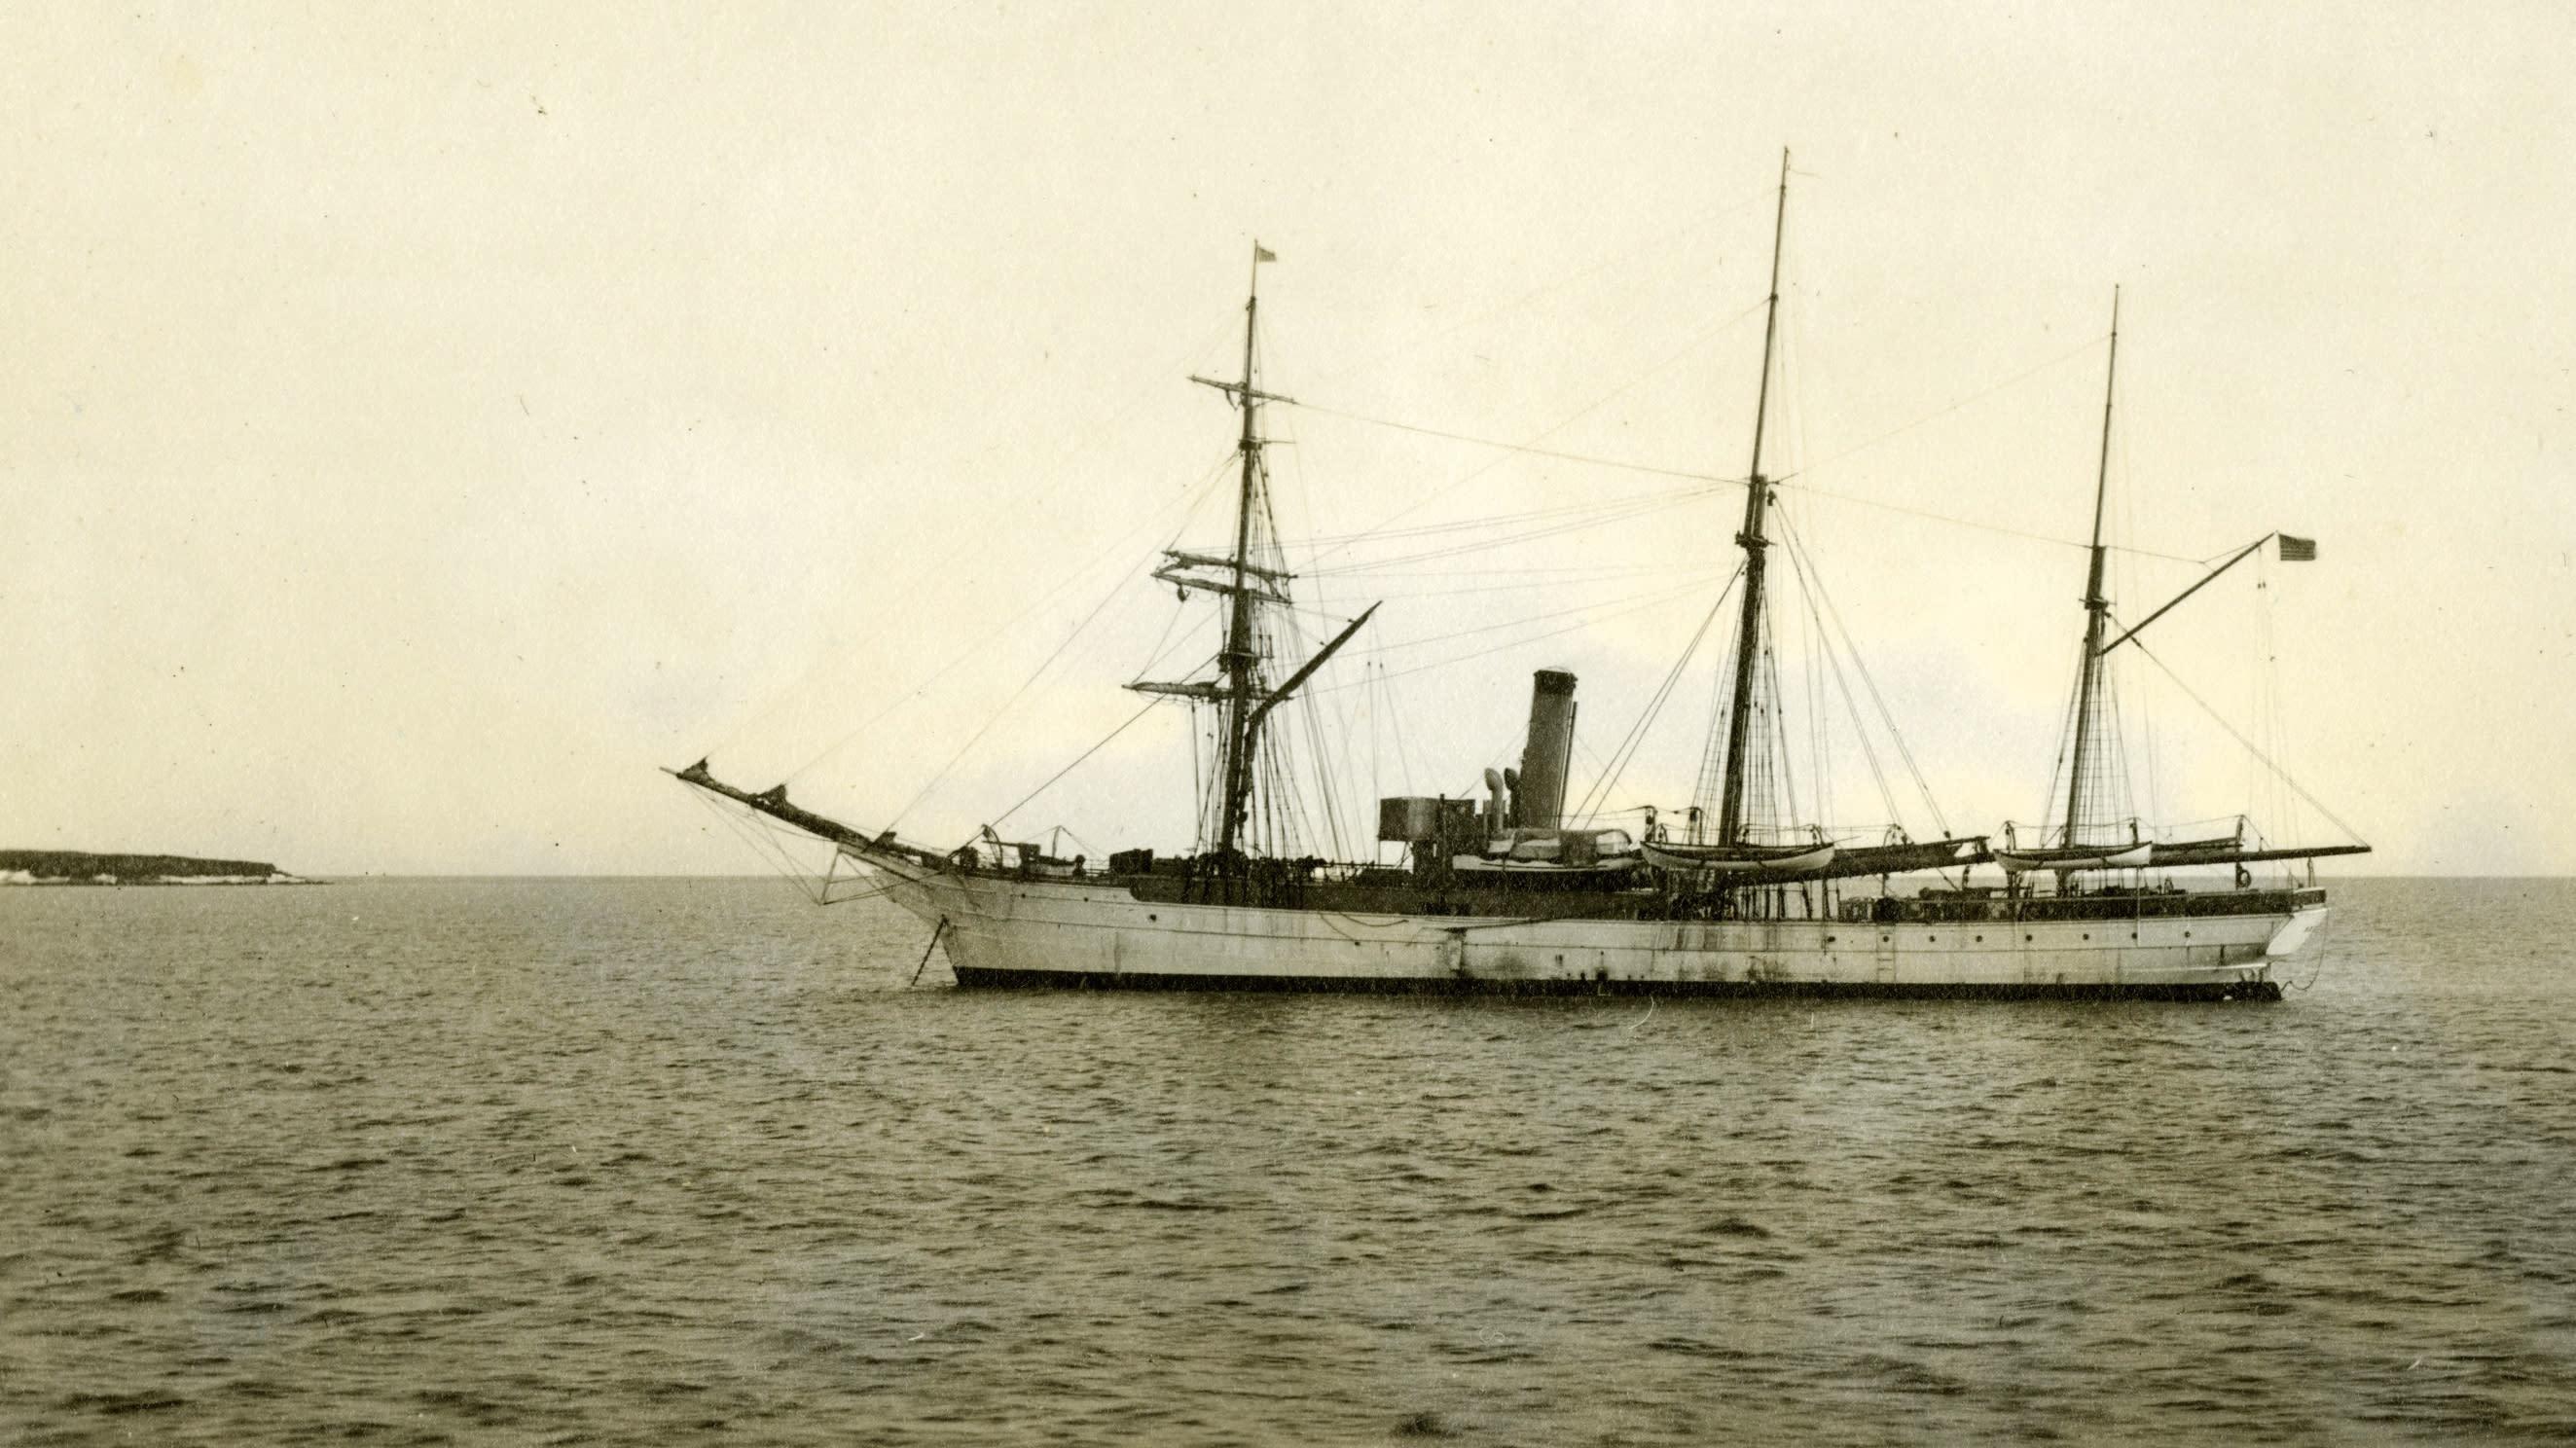 Coast Guard: Wreck found in Atlantic is storied cutter Bear